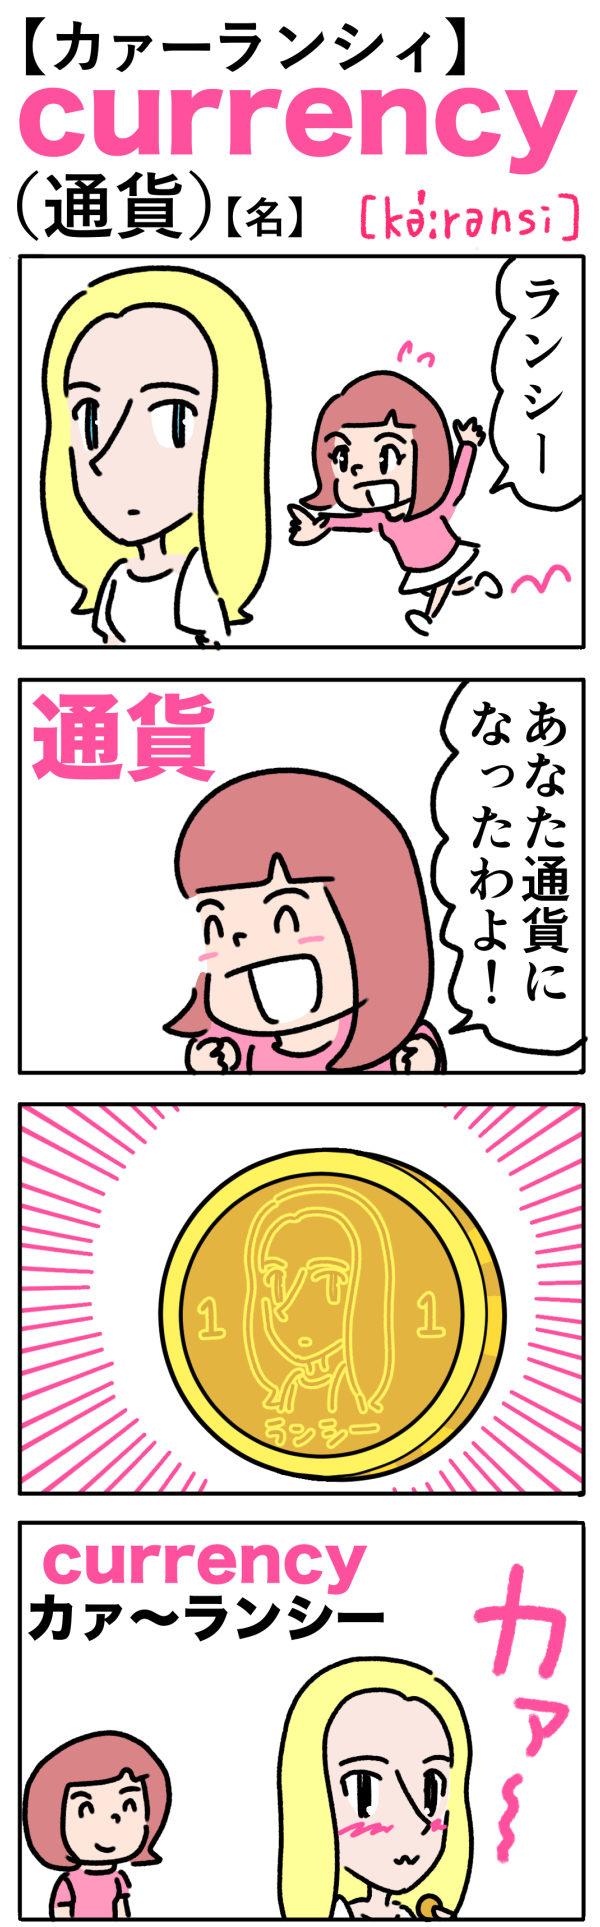 currency(通貨)の語呂合わせ英単語